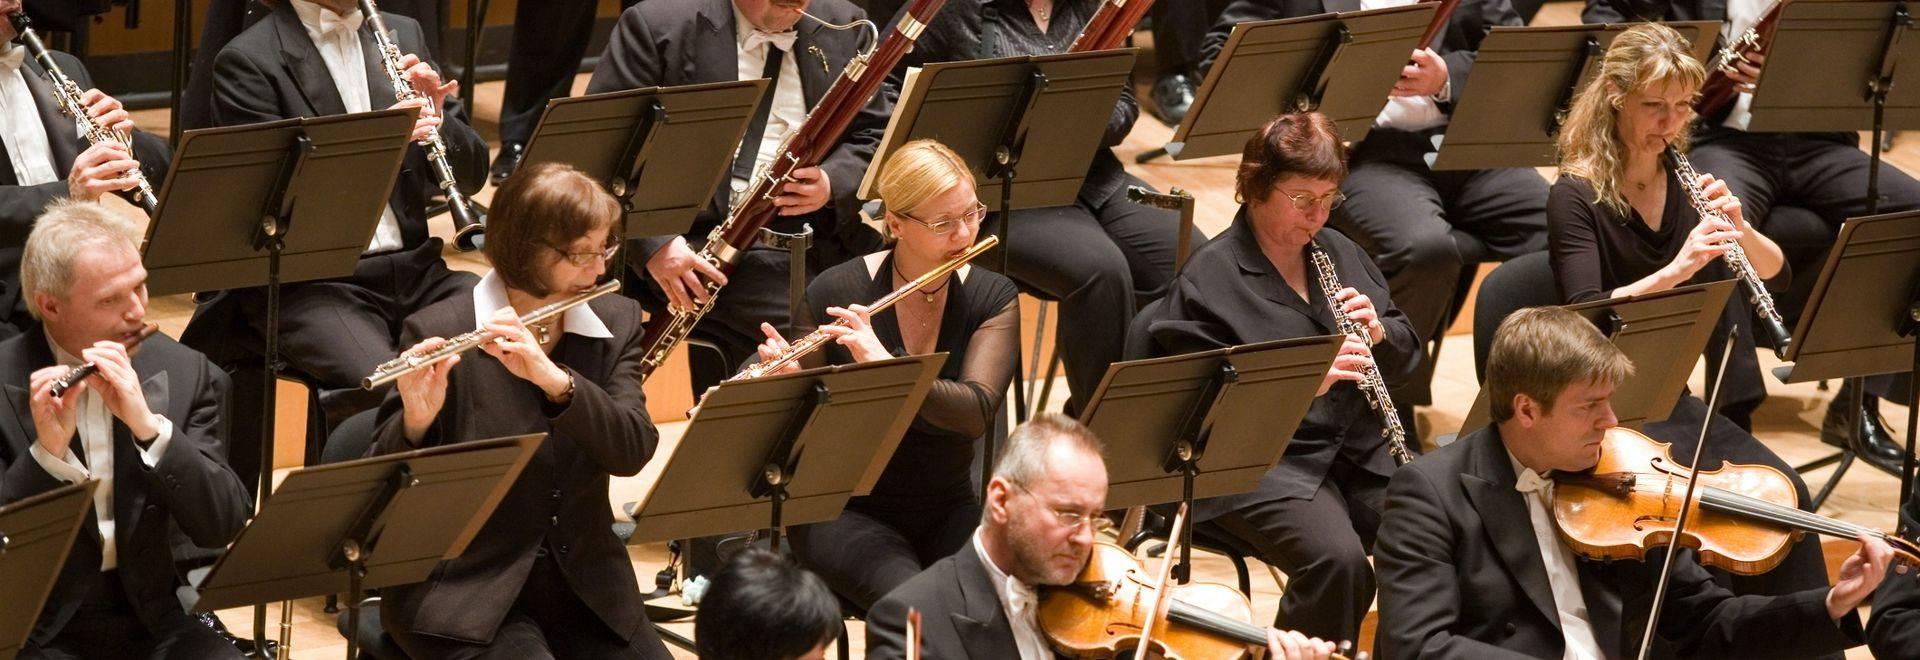 Dreamstime M 13865039 Brno Philharmonic Orchestra Perform